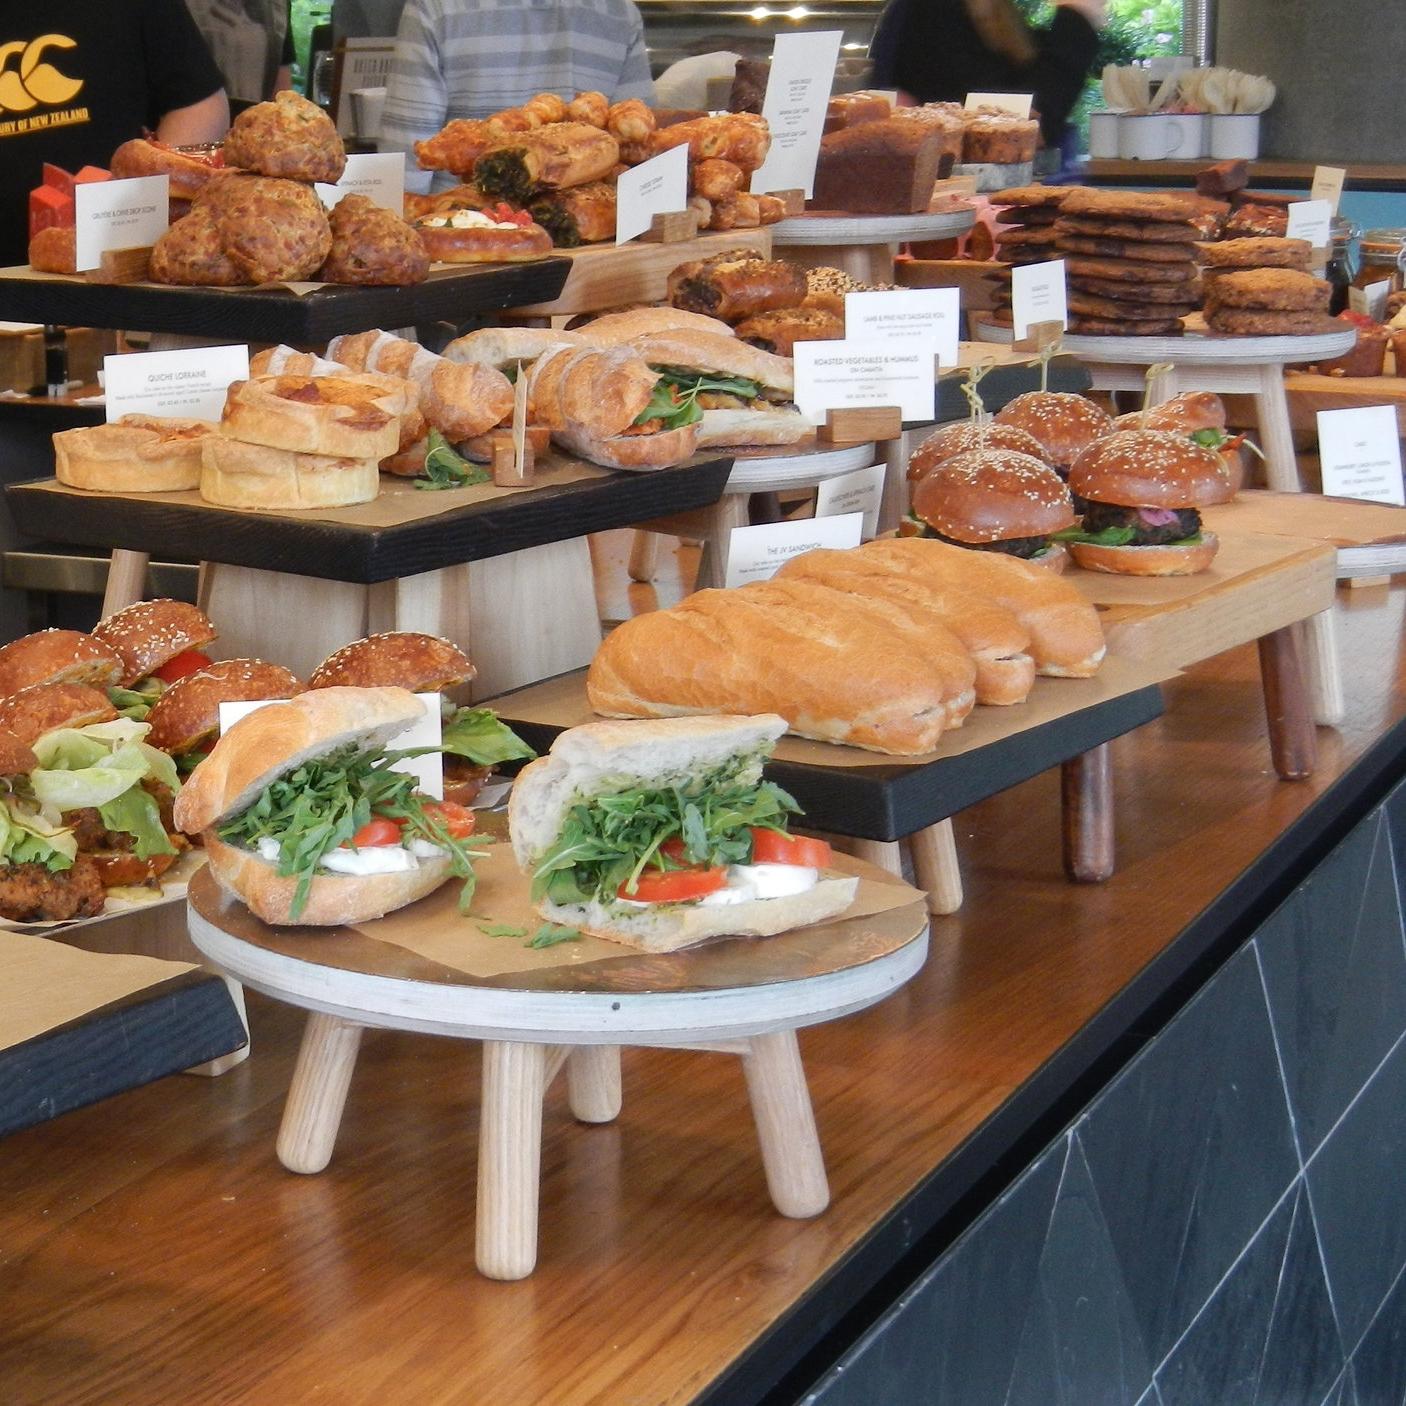 Gail's Artisan Bakery, London by The Doubtful Traveller